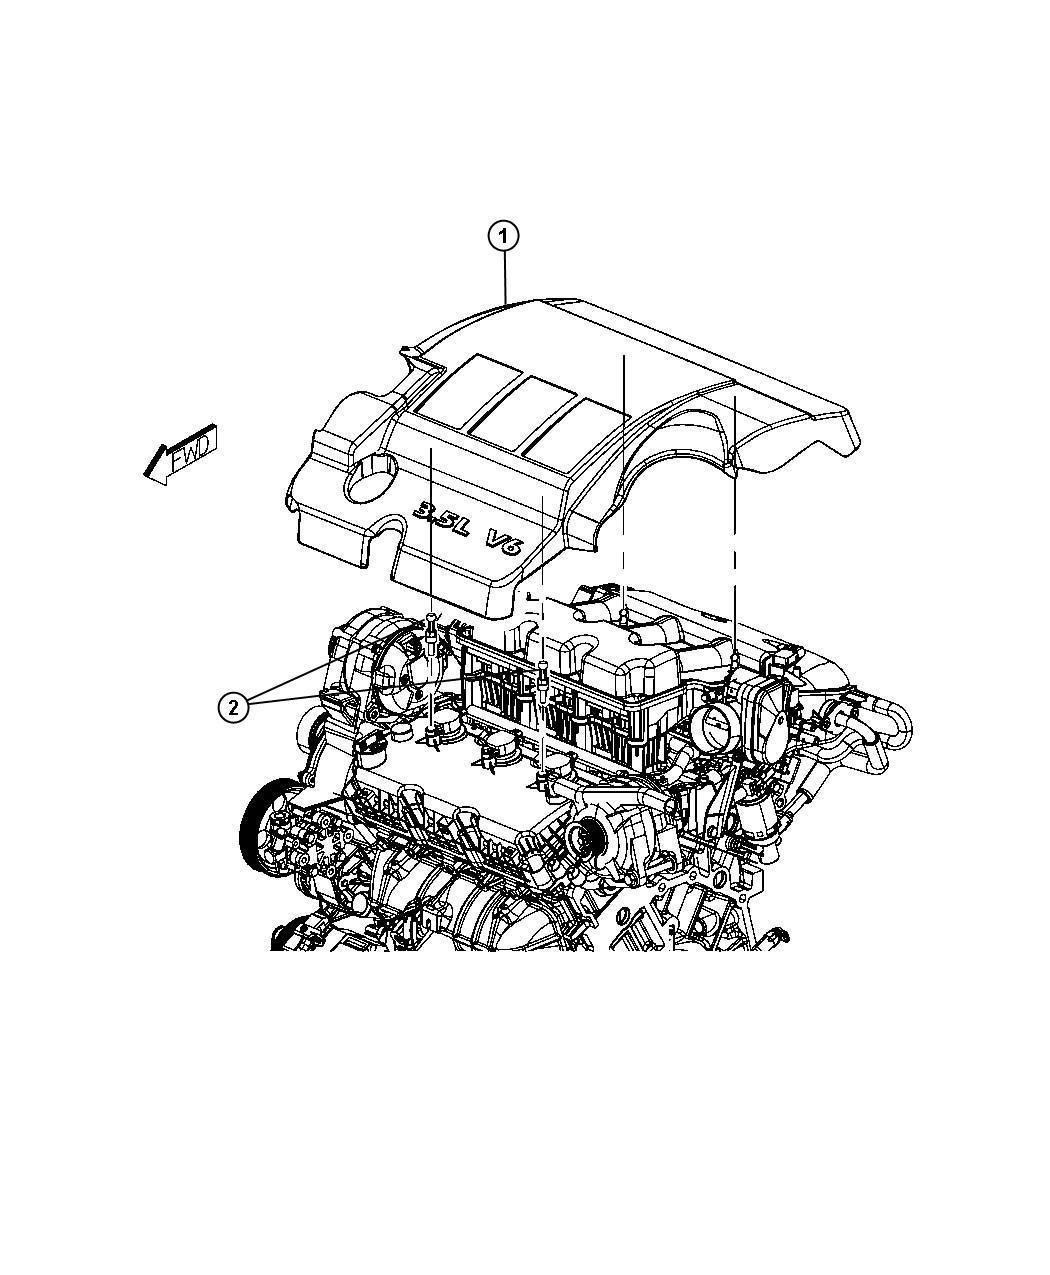 Dodge Avenger Ball stud. Mounting. Engine cover. Egf